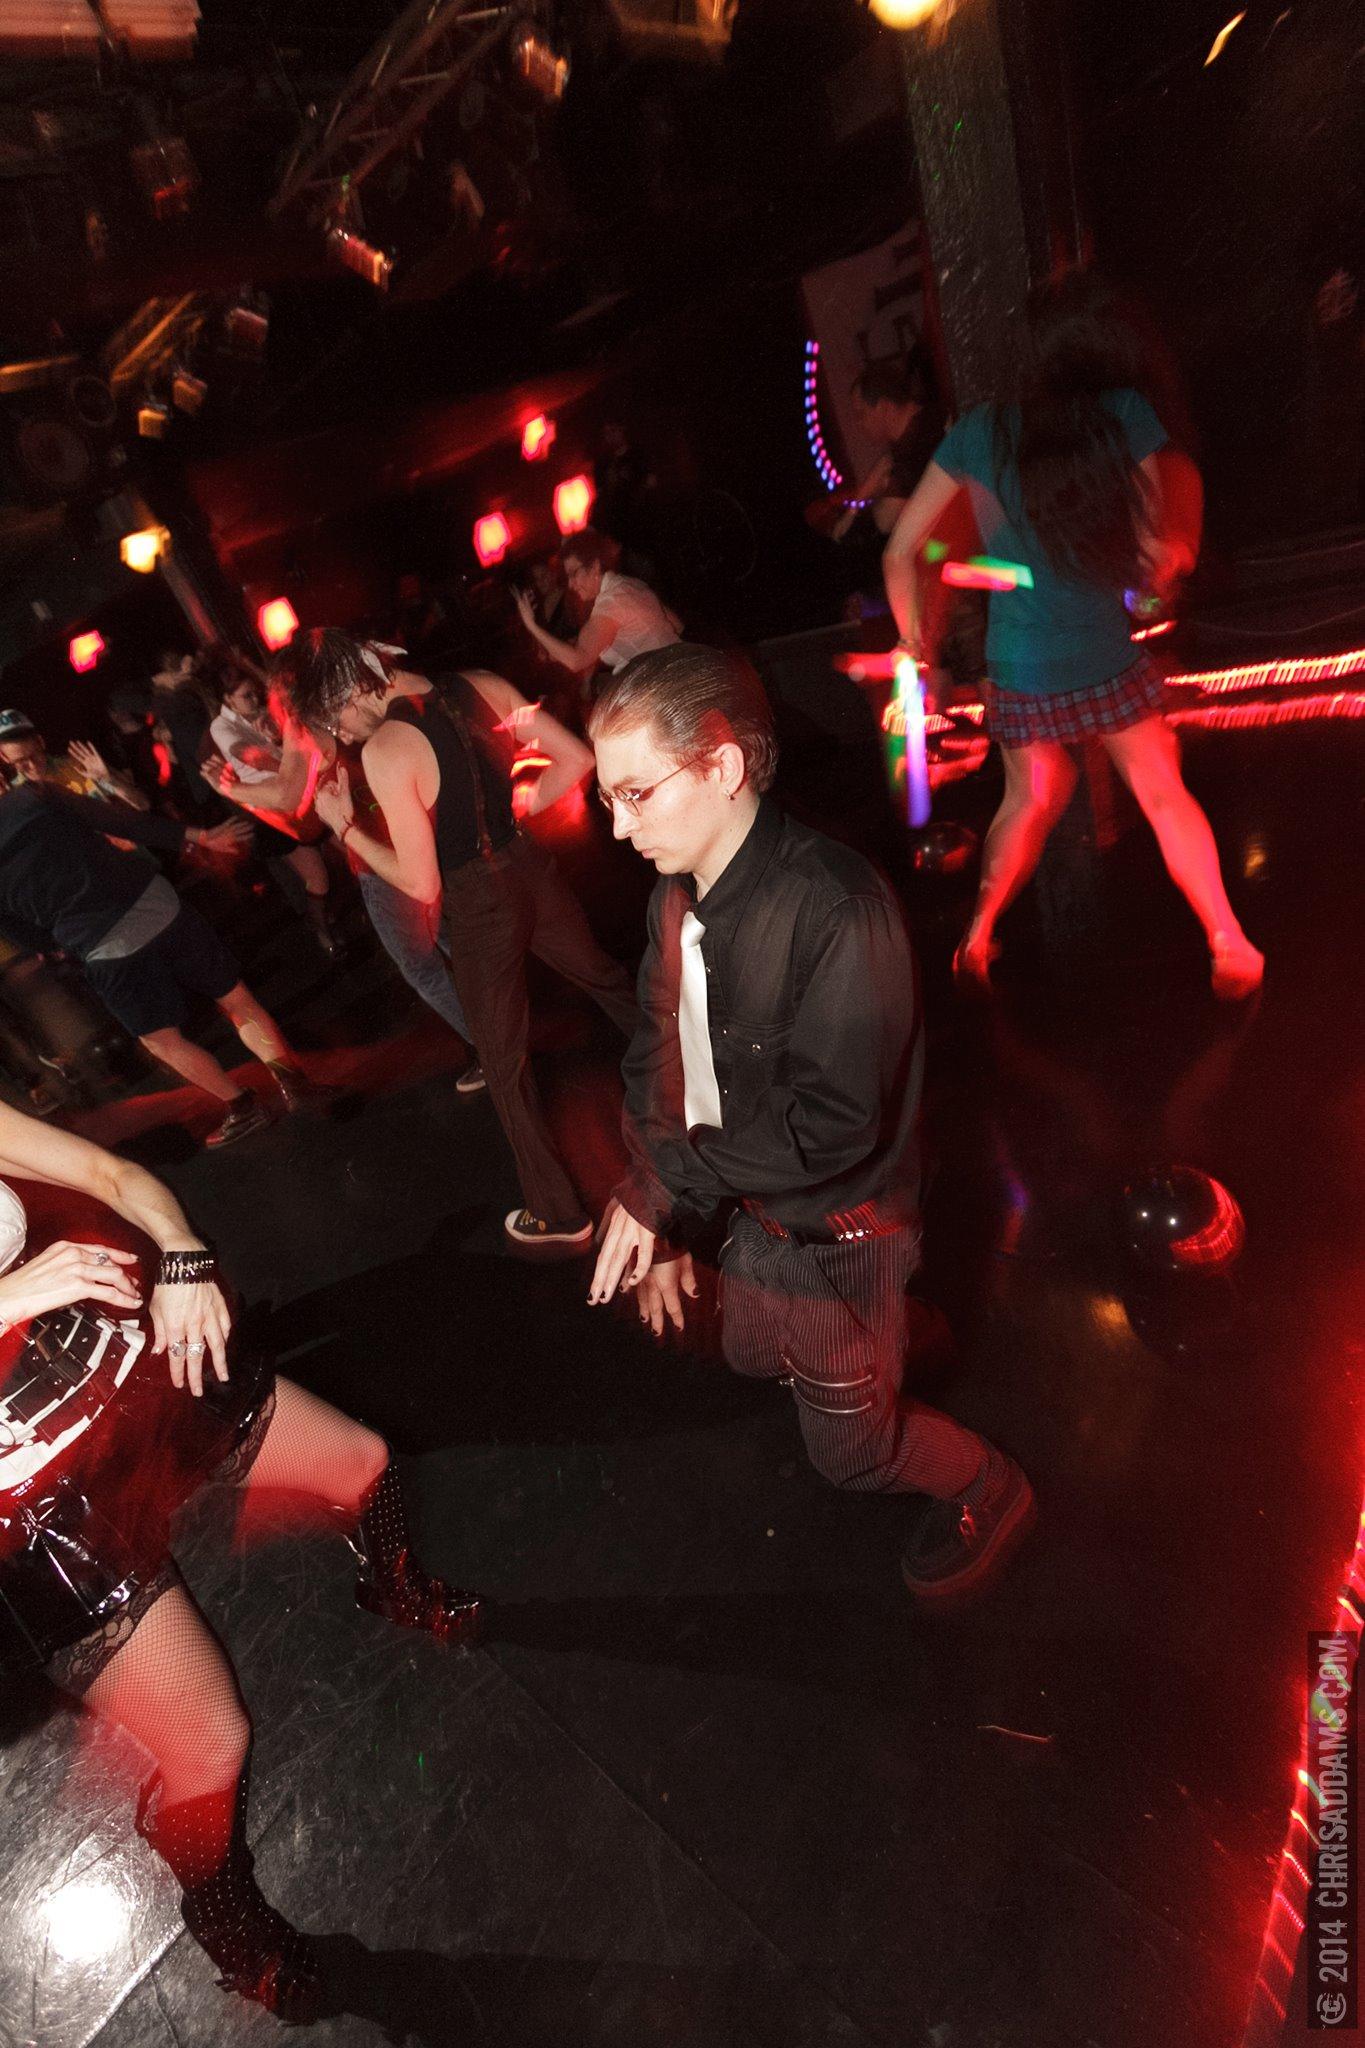 TheHavenClub-Goth-Industrial-Dance-Alternative-Northampton-MA (74).jpg